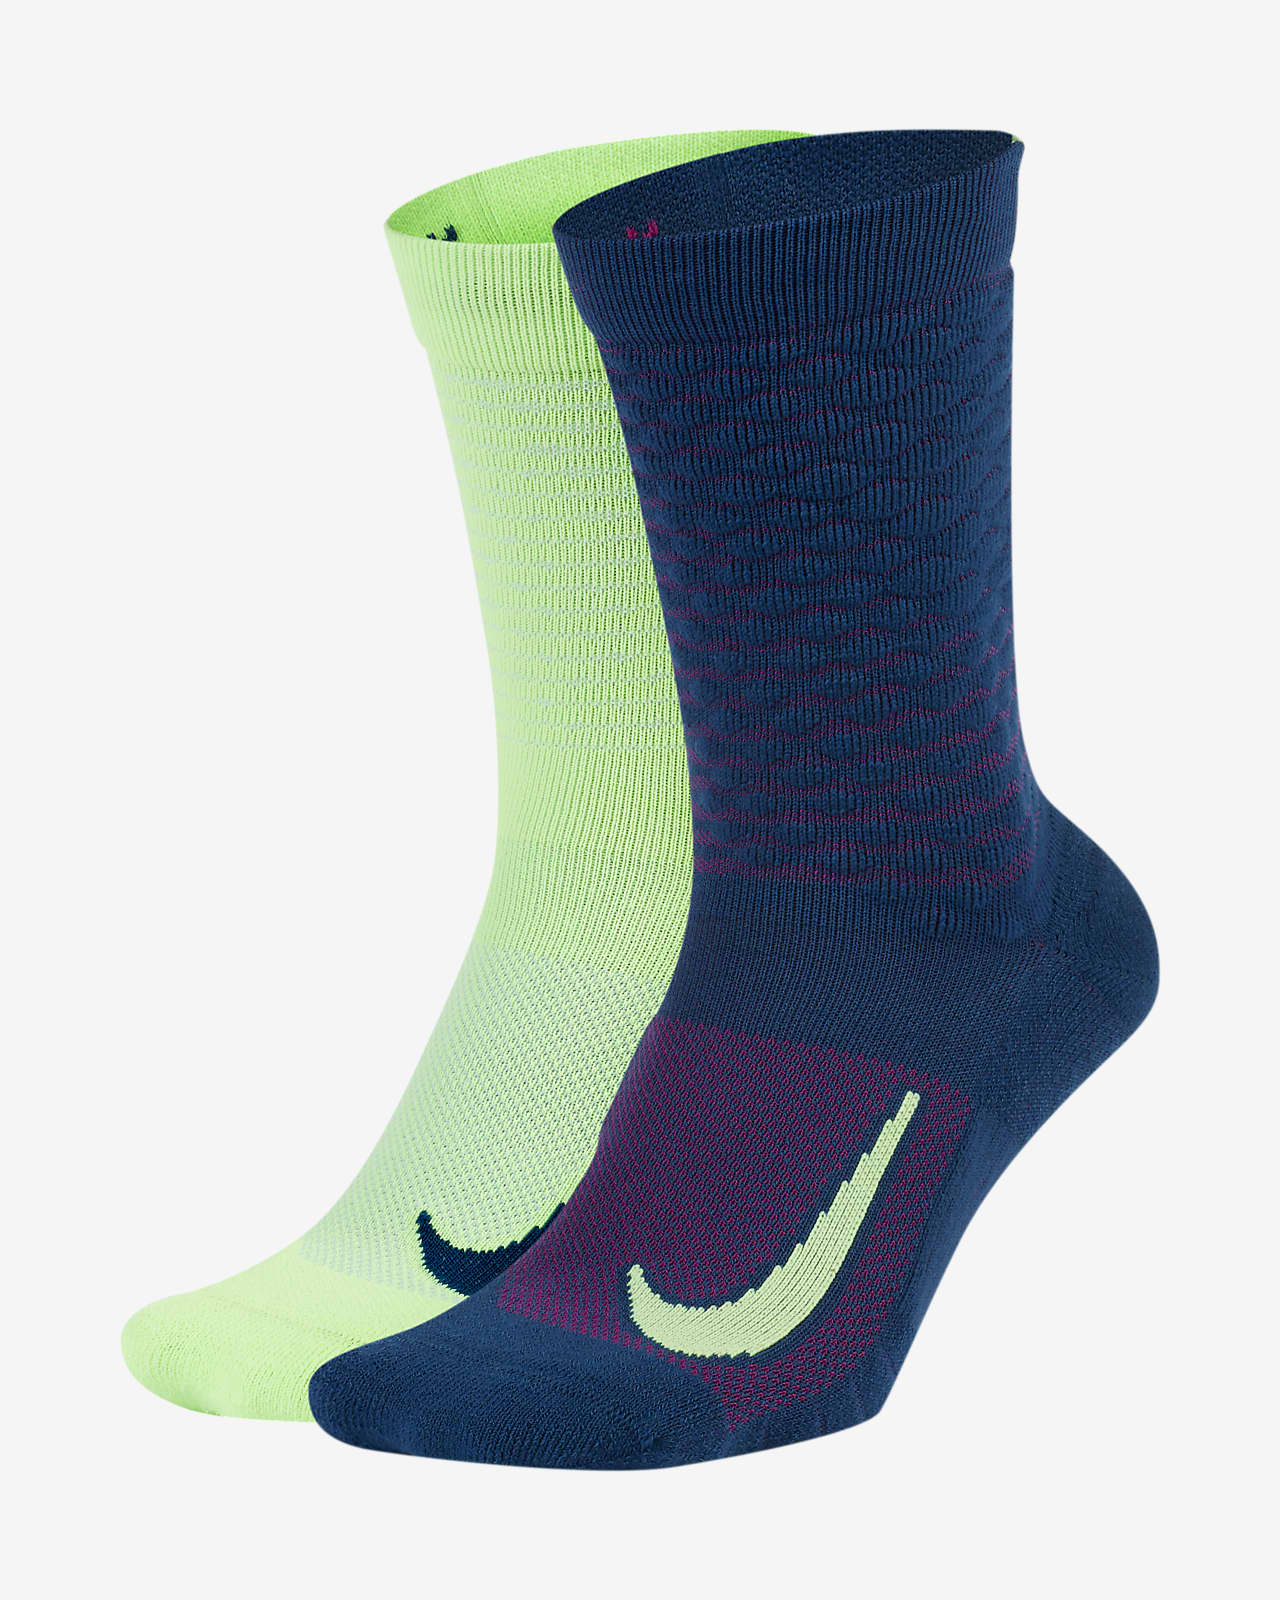 Nike Multiplier Atlas Calcetines largos de running (2 pares)